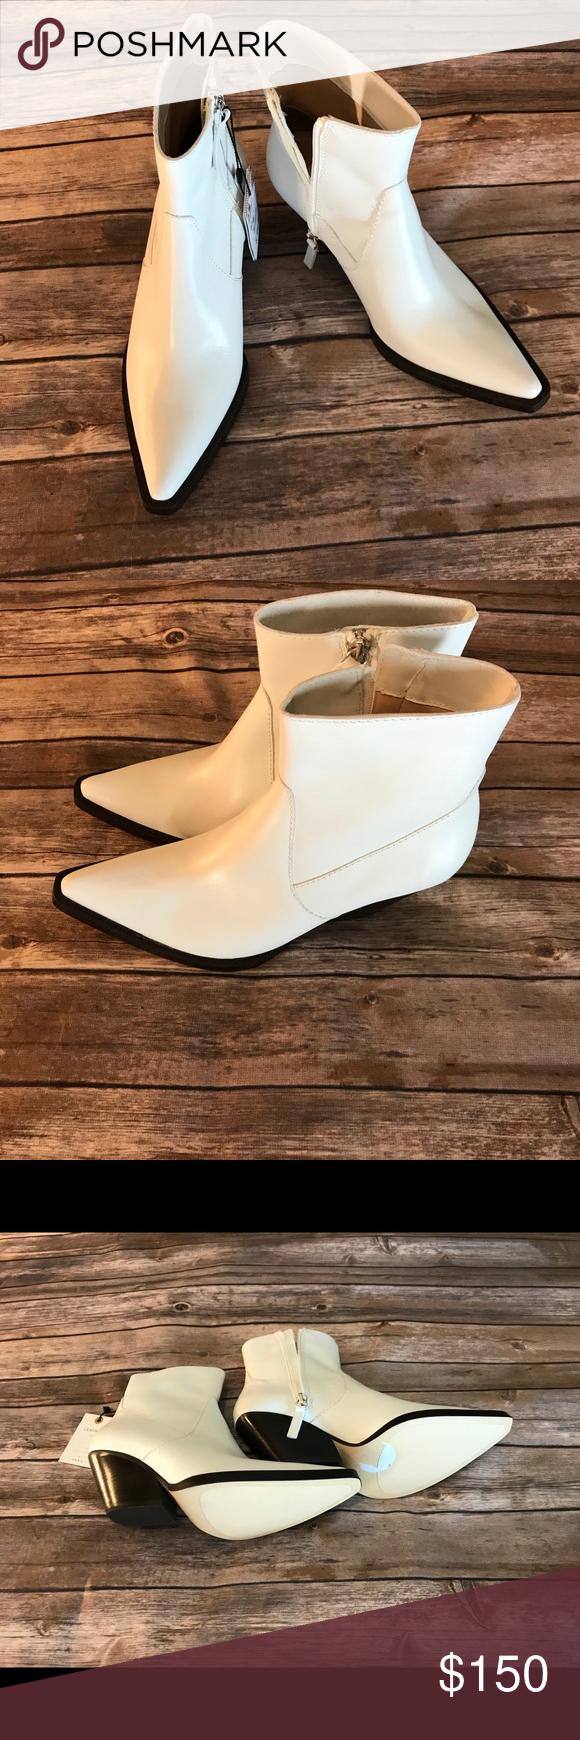 4f6eb2f0cc1 NWT Zara White Cowboy Boots Size 6.5 NWT Zara White Cowboy Boots ...